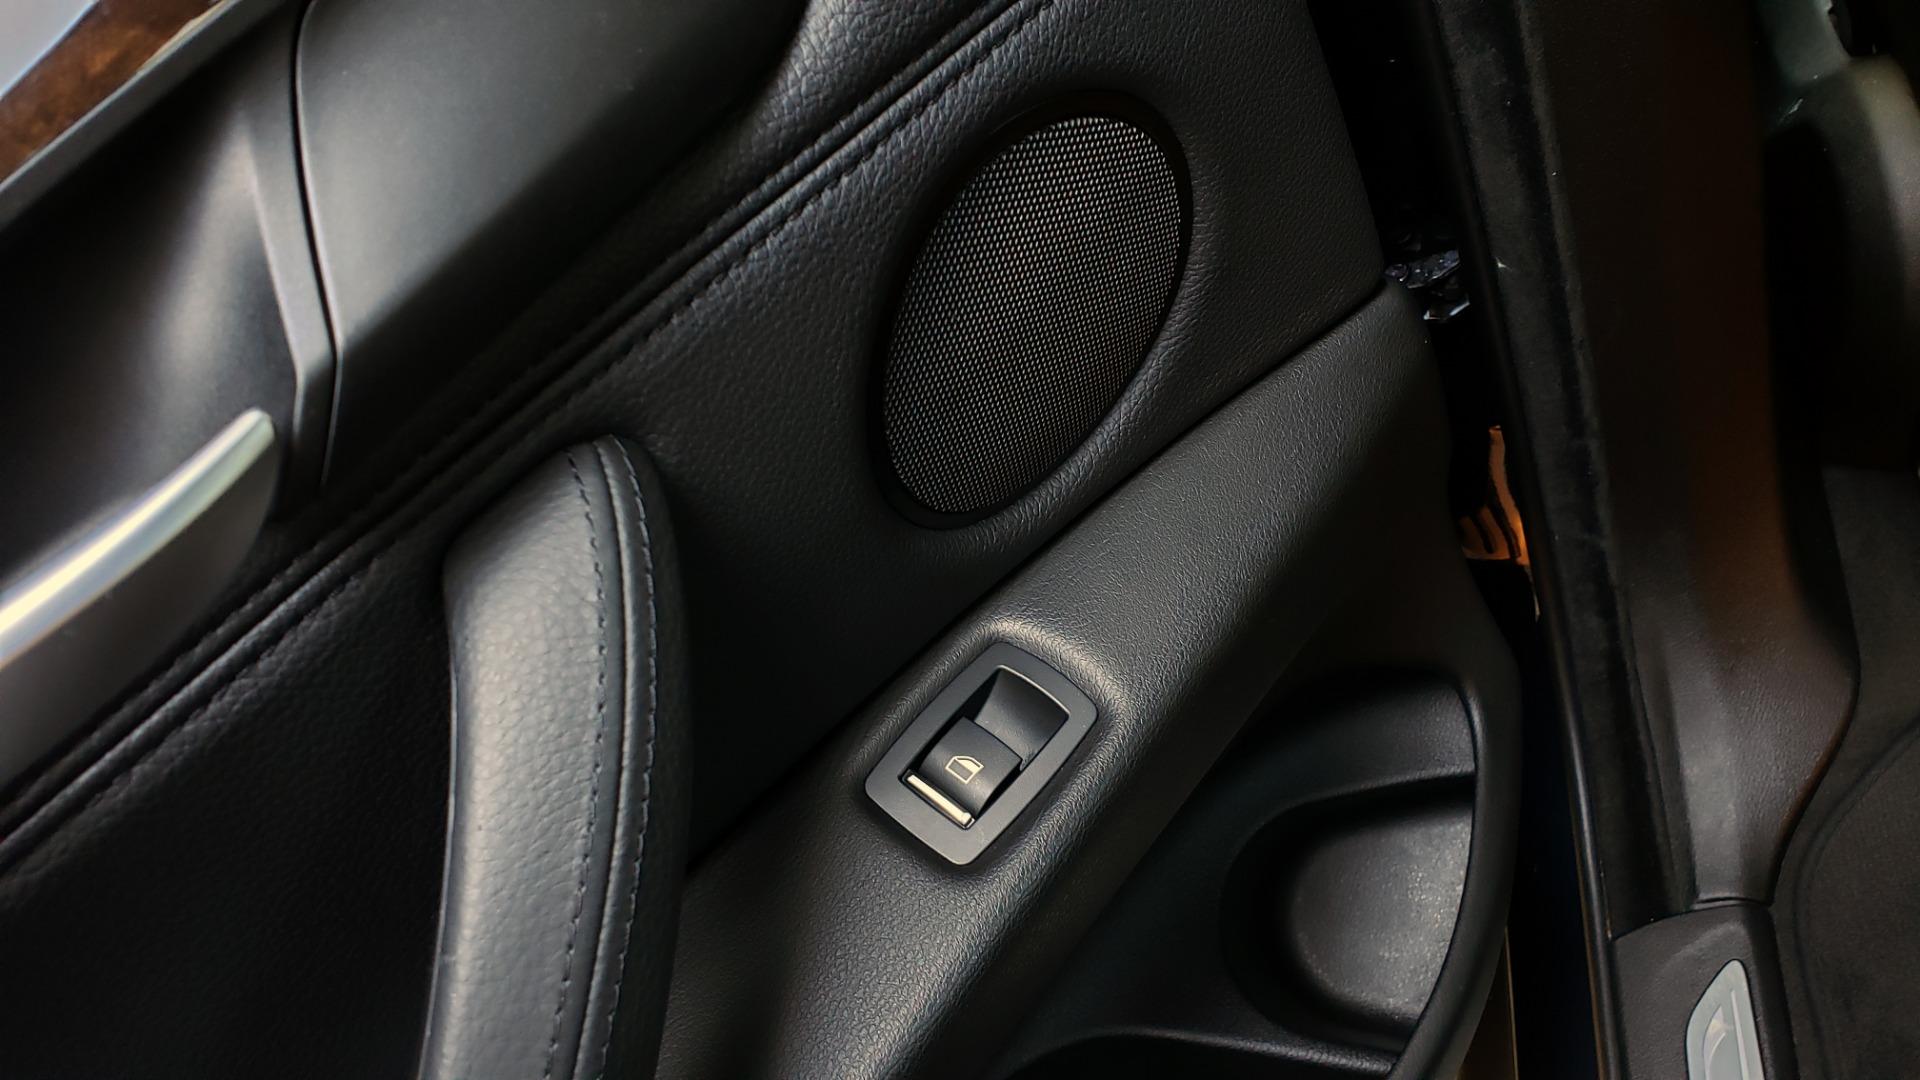 Used 2016 BMW X5 XDRIVE35I / PREM PKG / NAV / DRVR ASST PLUS / REARVIEW for sale $25,765 at Formula Imports in Charlotte NC 28227 42